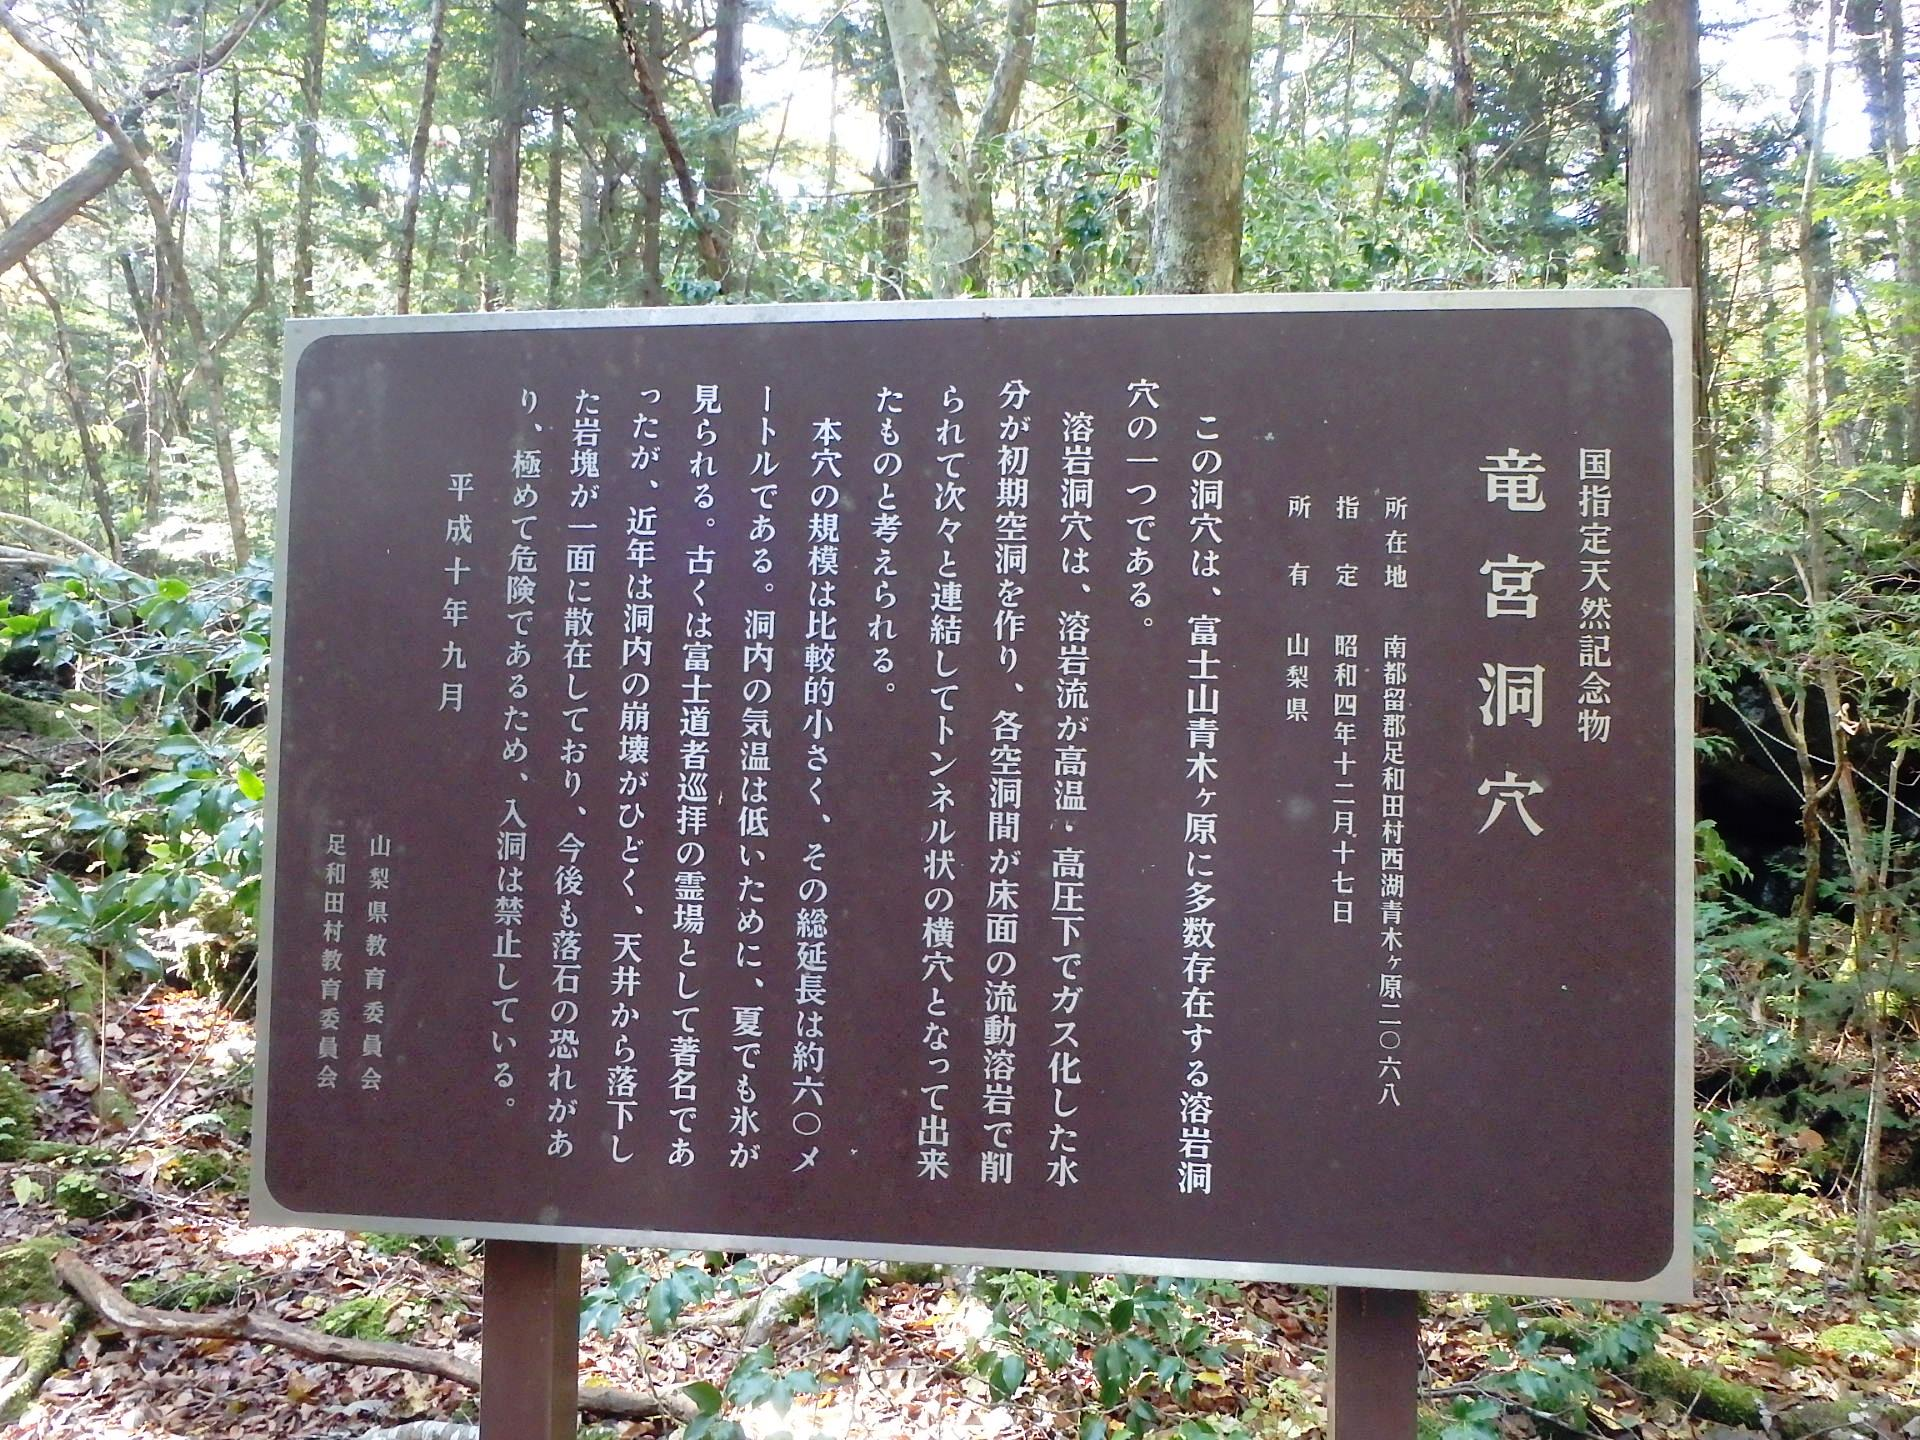 http://www.yamanashi-kankou.jp/blog/L43T9j_15.jpg